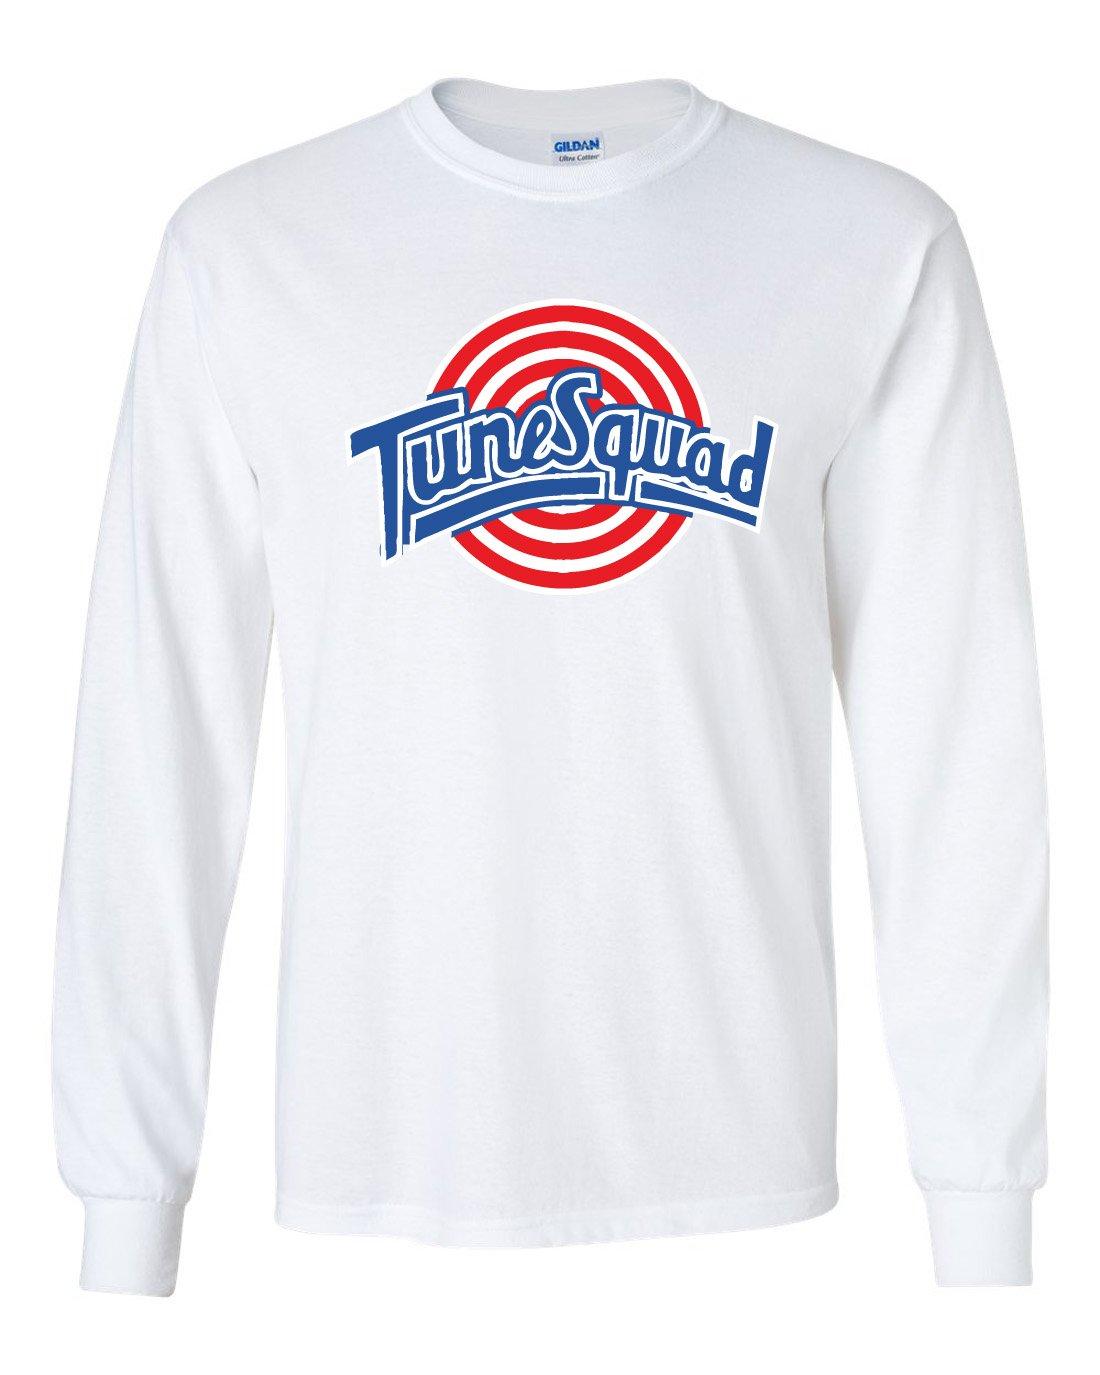 The Silo LONG SLEEVE White Spacejam Tunesquad ''Jordan'' Front & Back T-Shirt ADULT